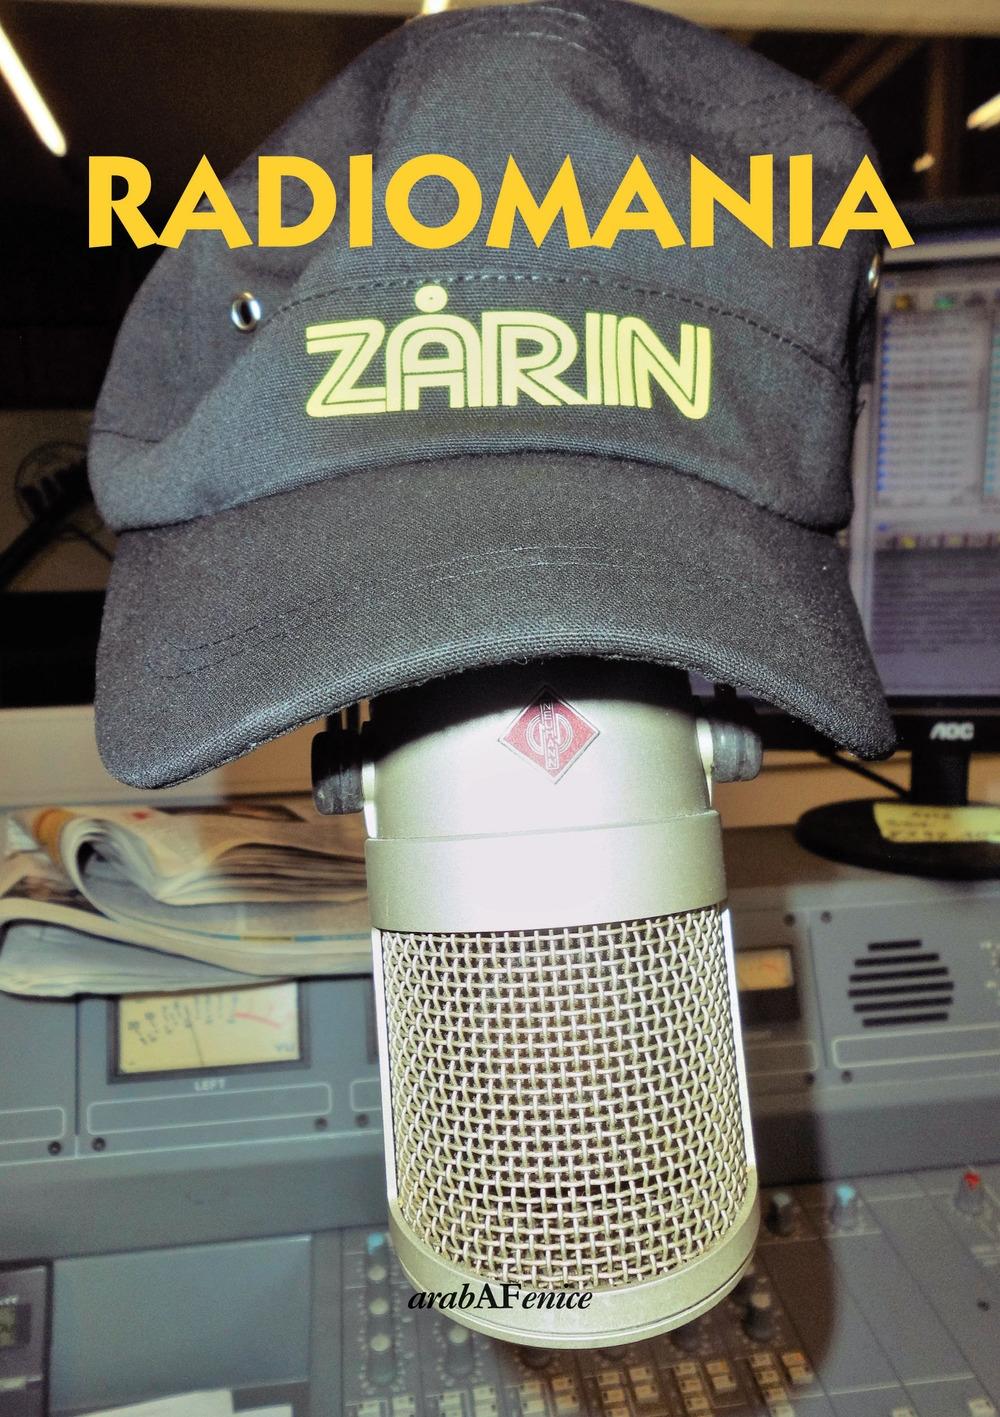 Radiomania